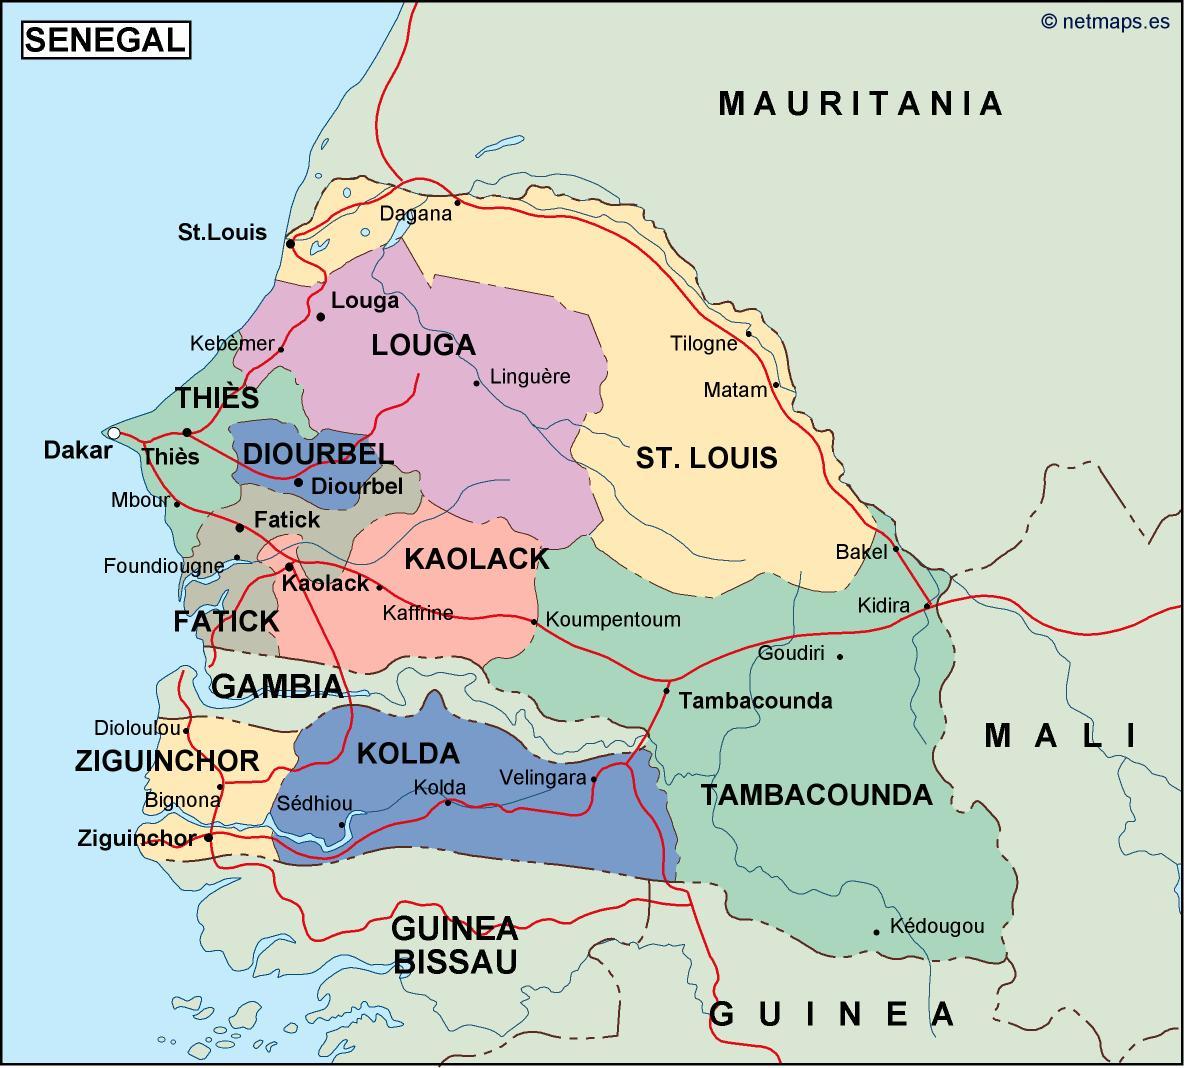 Senegal Mapa Politico En Illustrator Netmaps Mapas De Espana Y